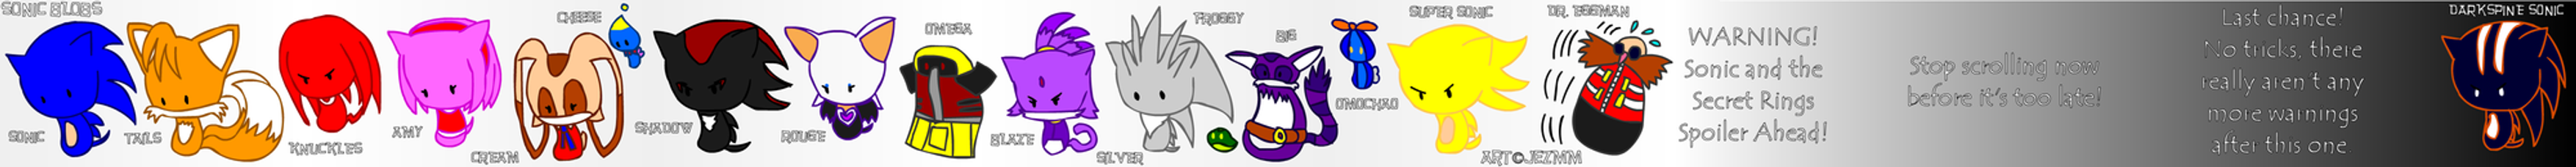 Sonic Blobs by JezMM